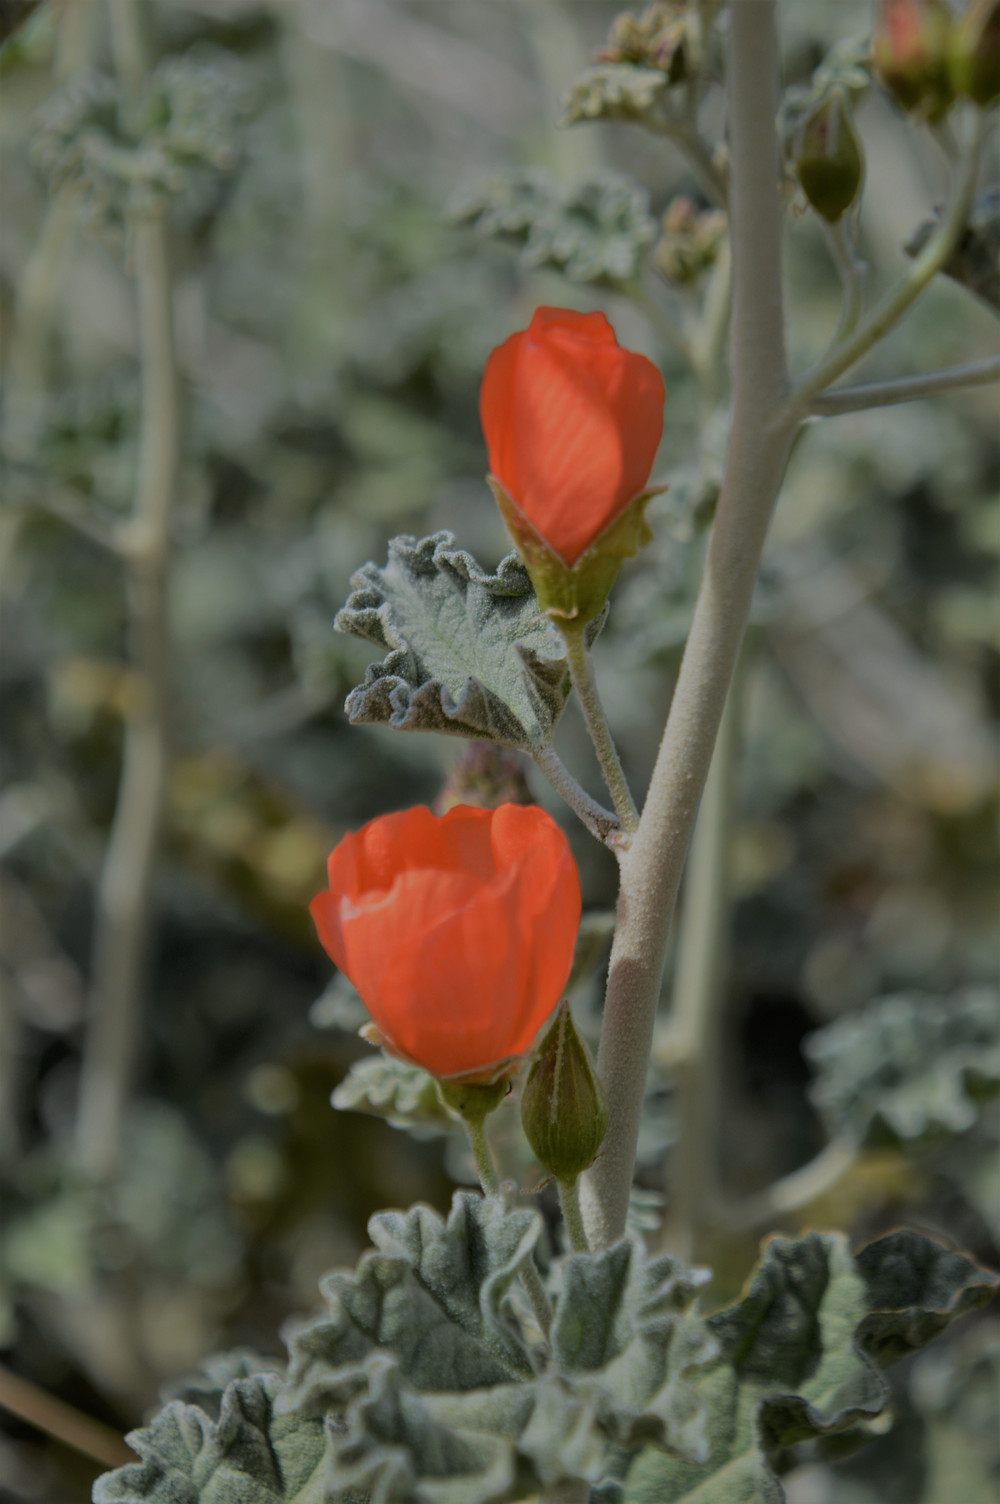 Orange desert globe mallow plants along the Big Morongo Canyon Trail in the Little San Bernardino Mountains in Morongo Valley